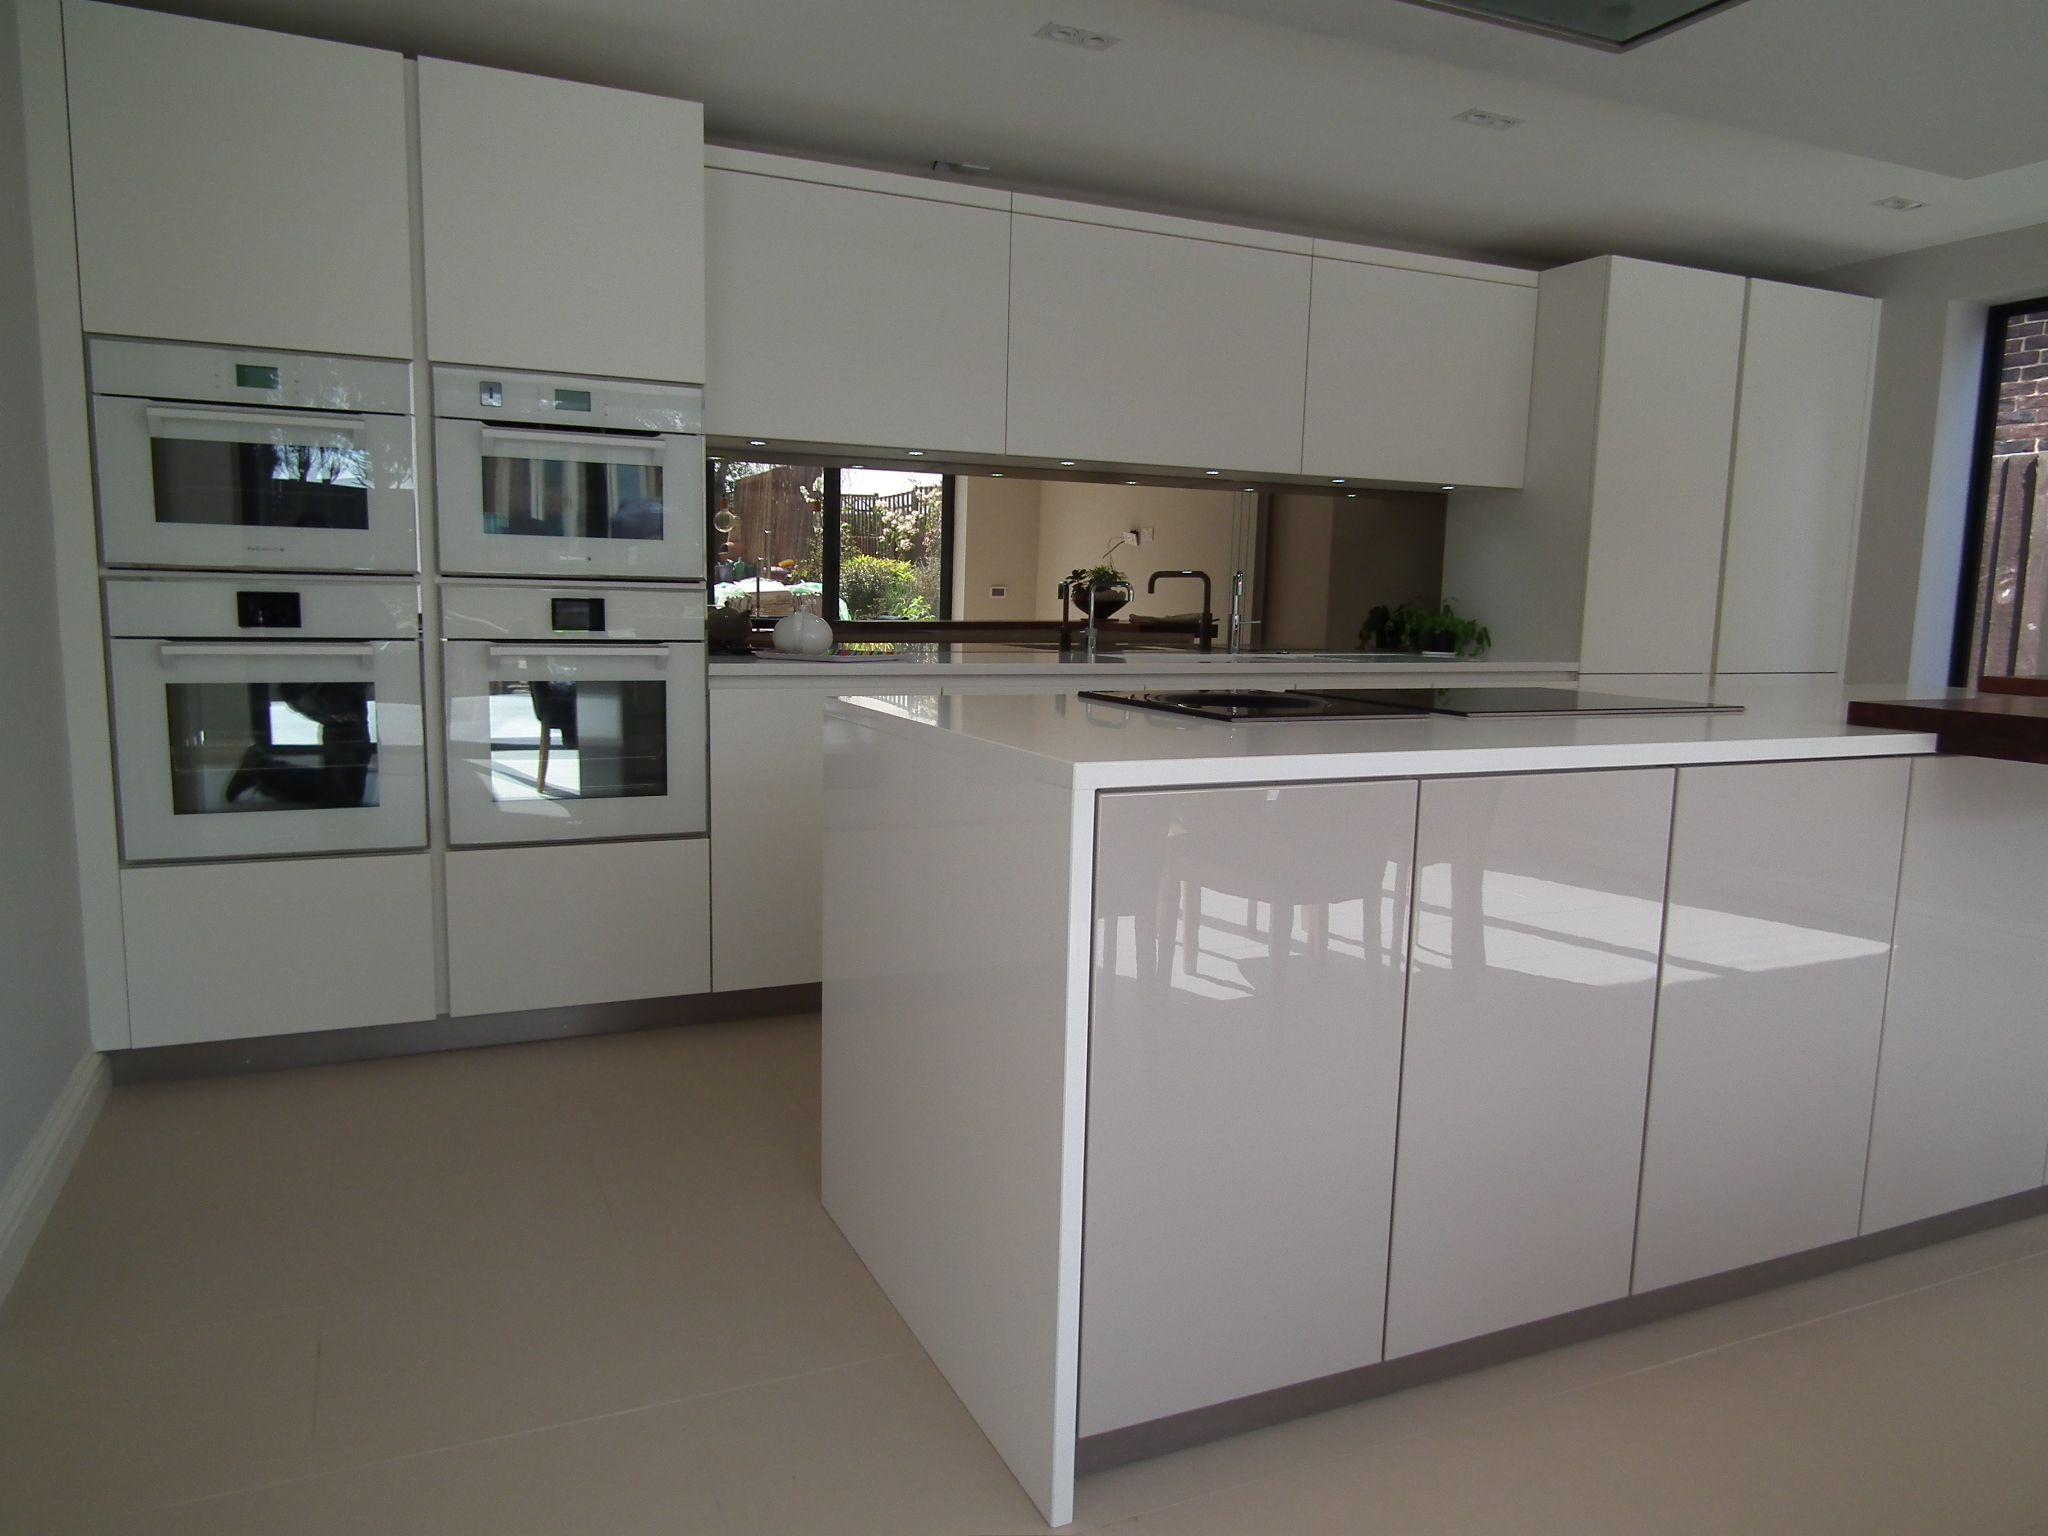 Uncategorized Uk Kitchen Appliances de dietrich white glass appliances www ptckitchens co uk uk